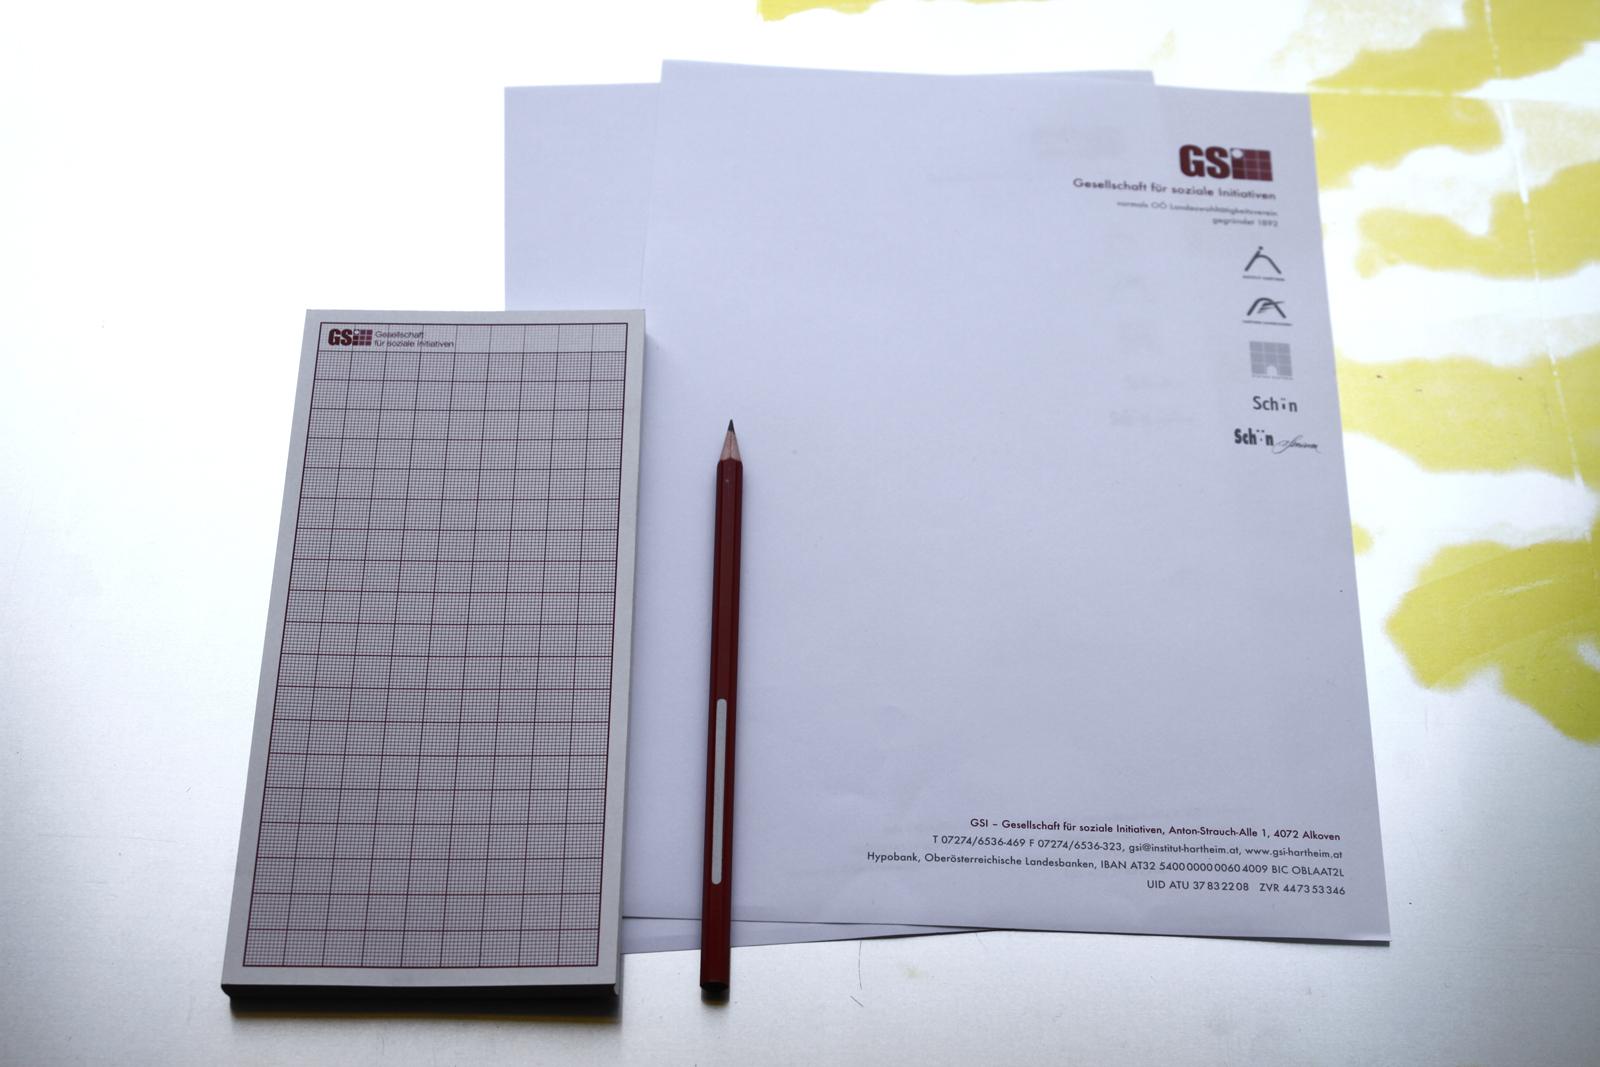 GSI Geschaeftsdrucksorten – Gesellschaften für soziale Initiativen © Martin Bruner Sombrero Design